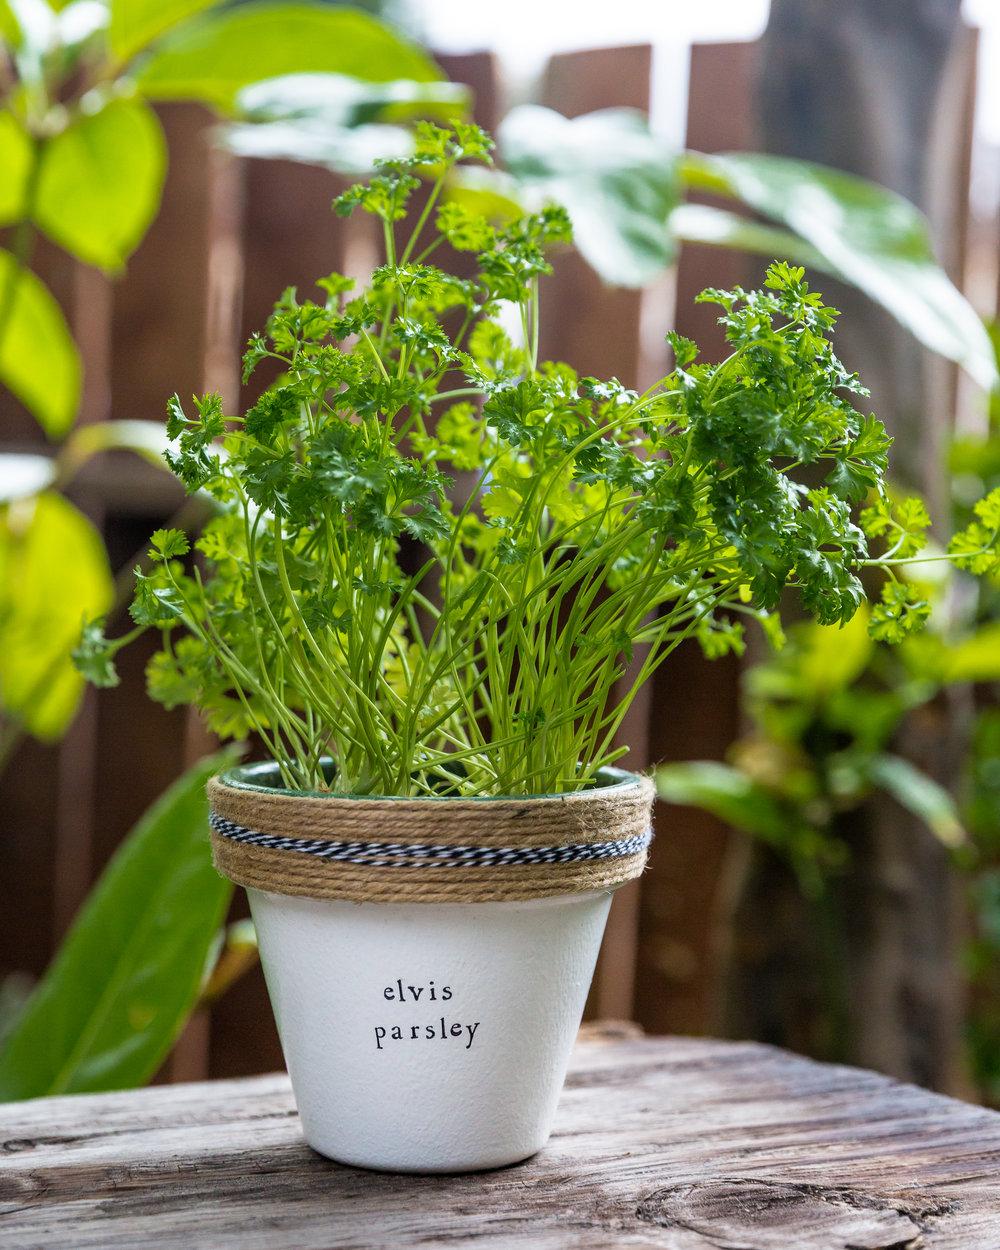 170510 plant puns - 4818.jpg